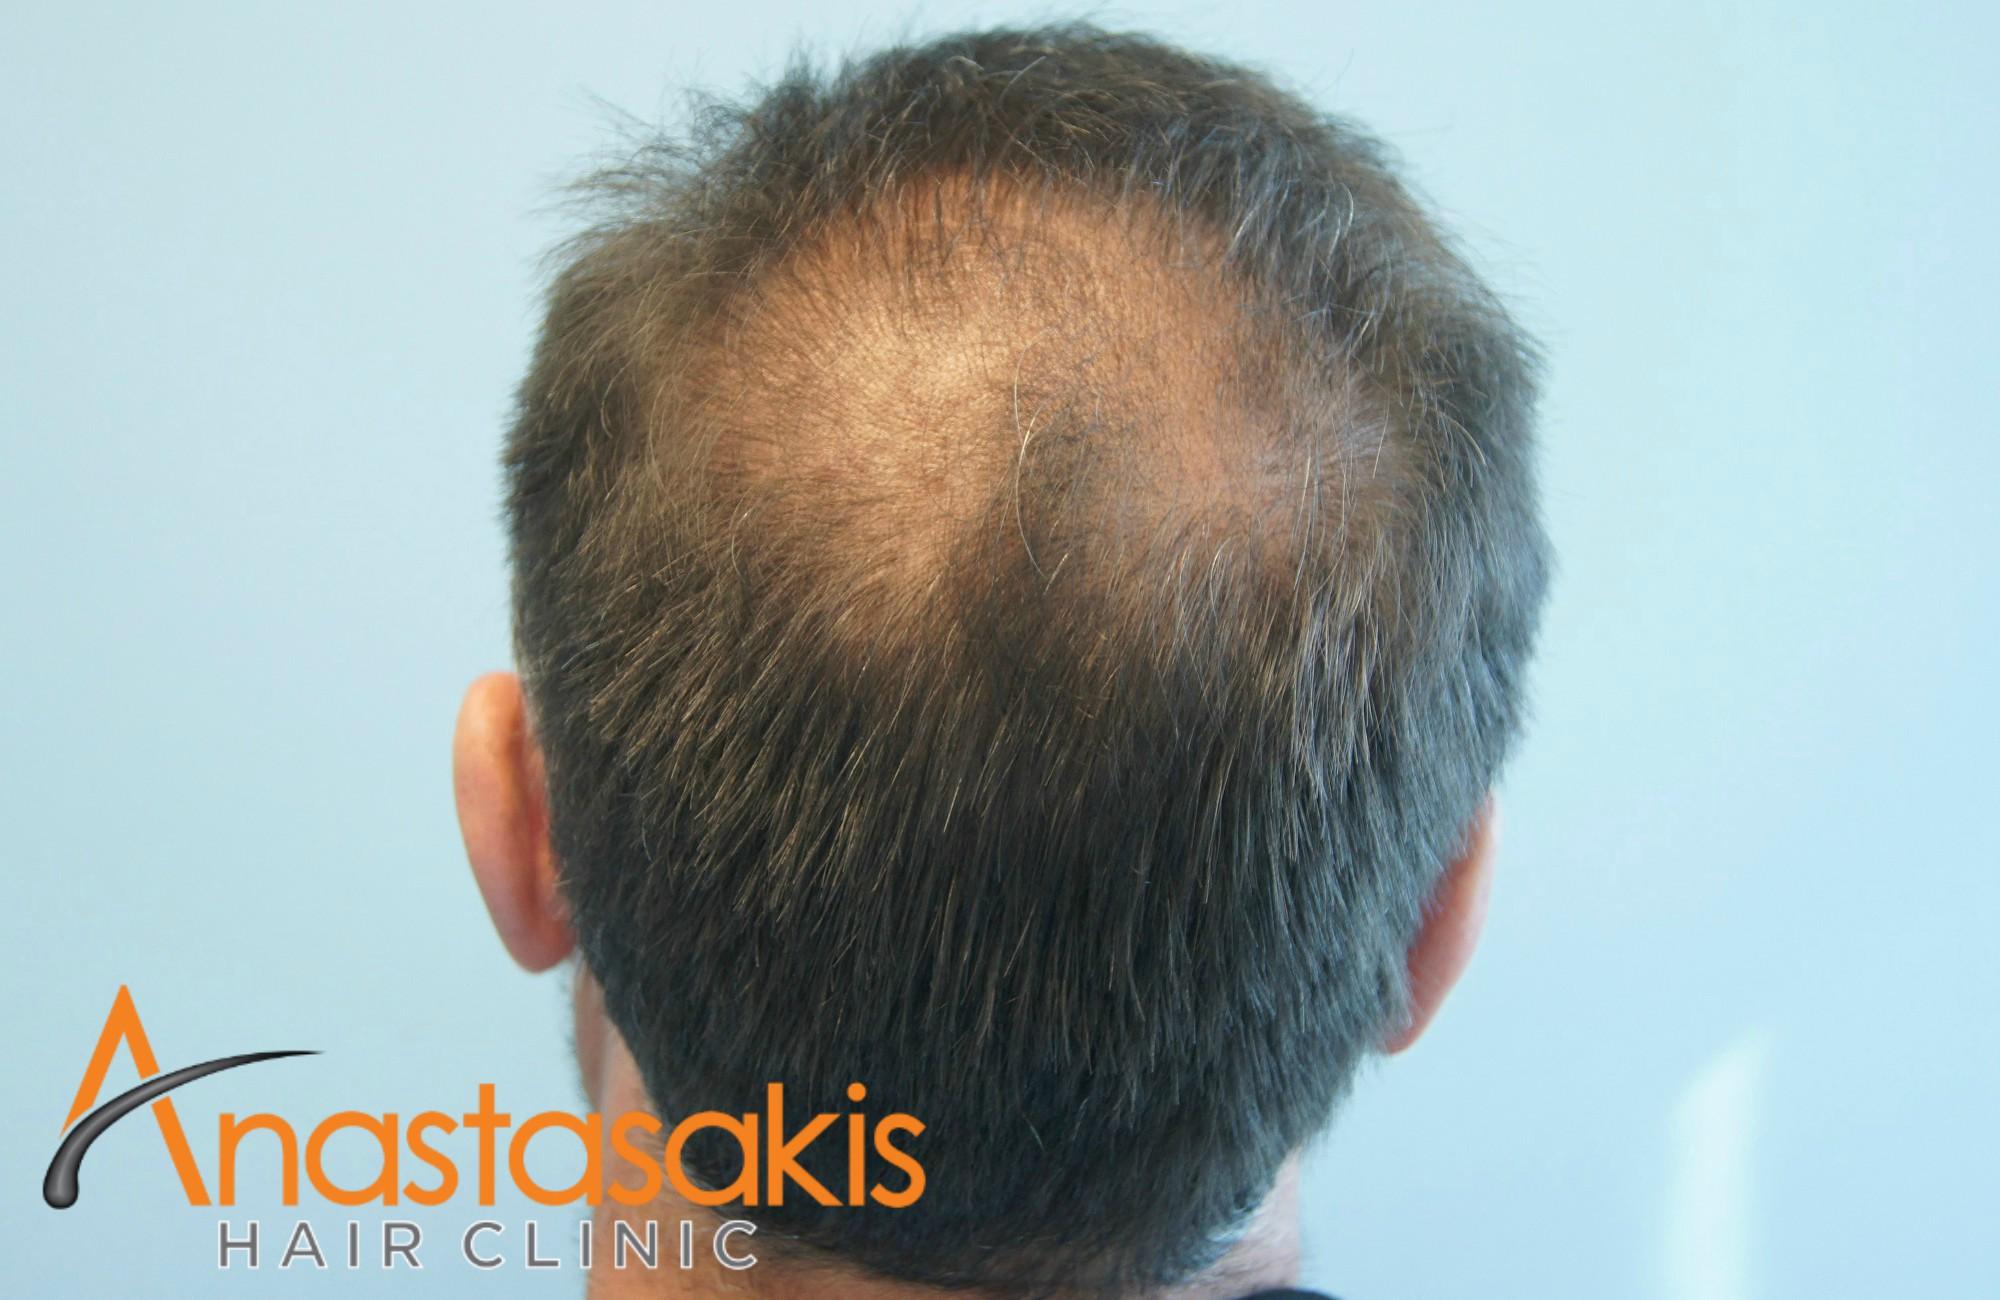 crown ασθενη μετά την επέμβαση μαλλιών με 3110 fus